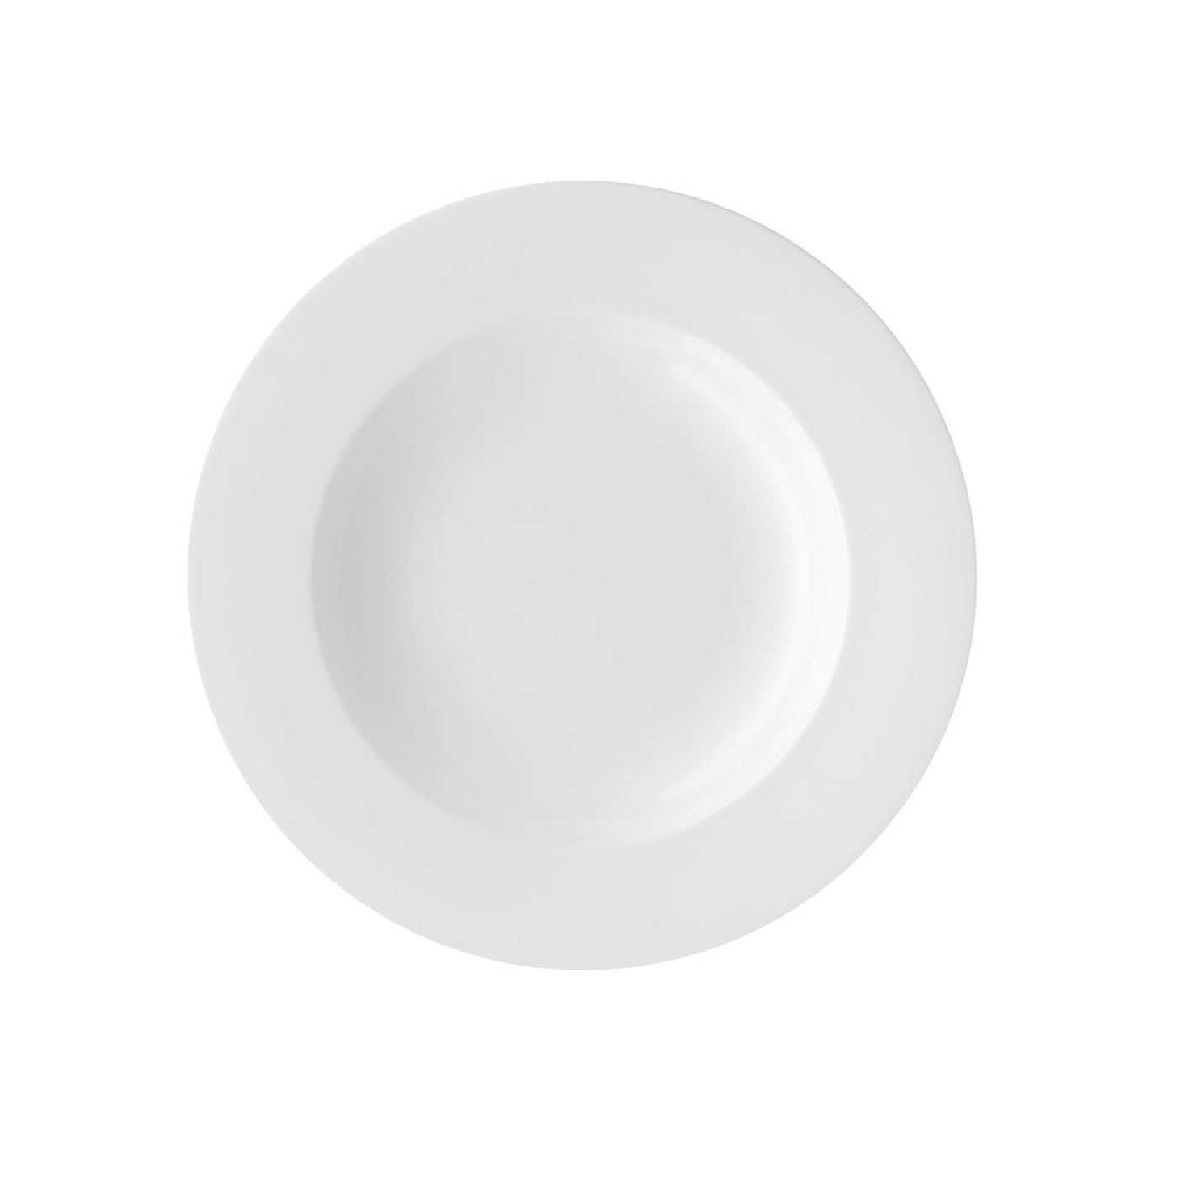 Тарелка глубокая фарфоровая Rosenthal JADE, диаметр 23 см, белый Rosenthal 61040-800001-10123 фото 1